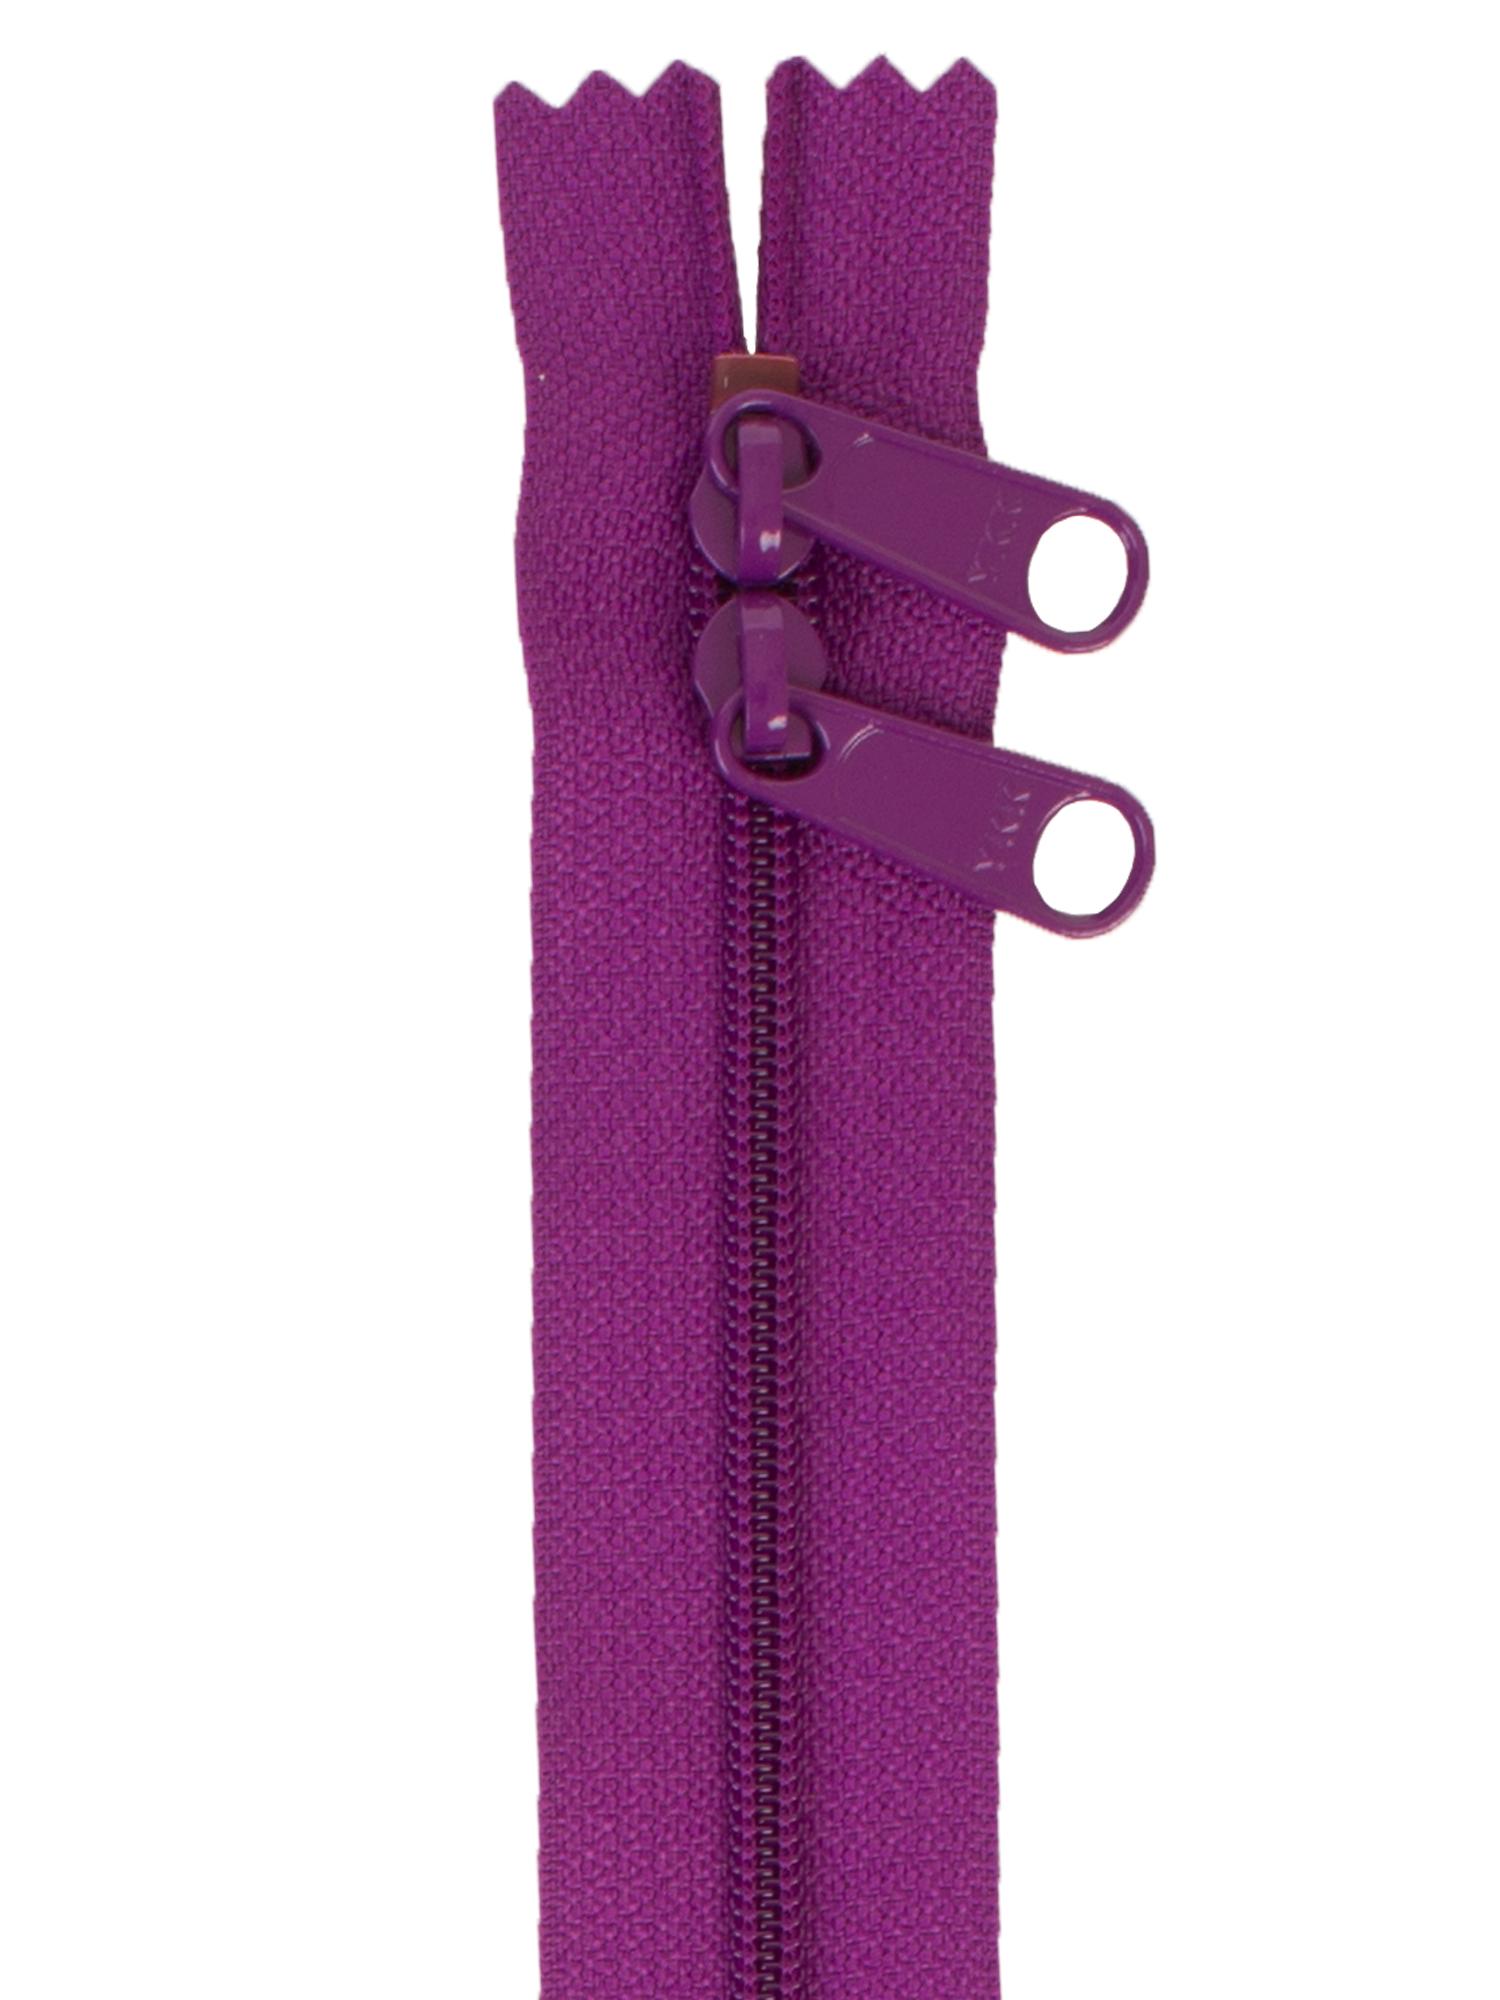 ByAnnie Black 30 Double Slide Zipper